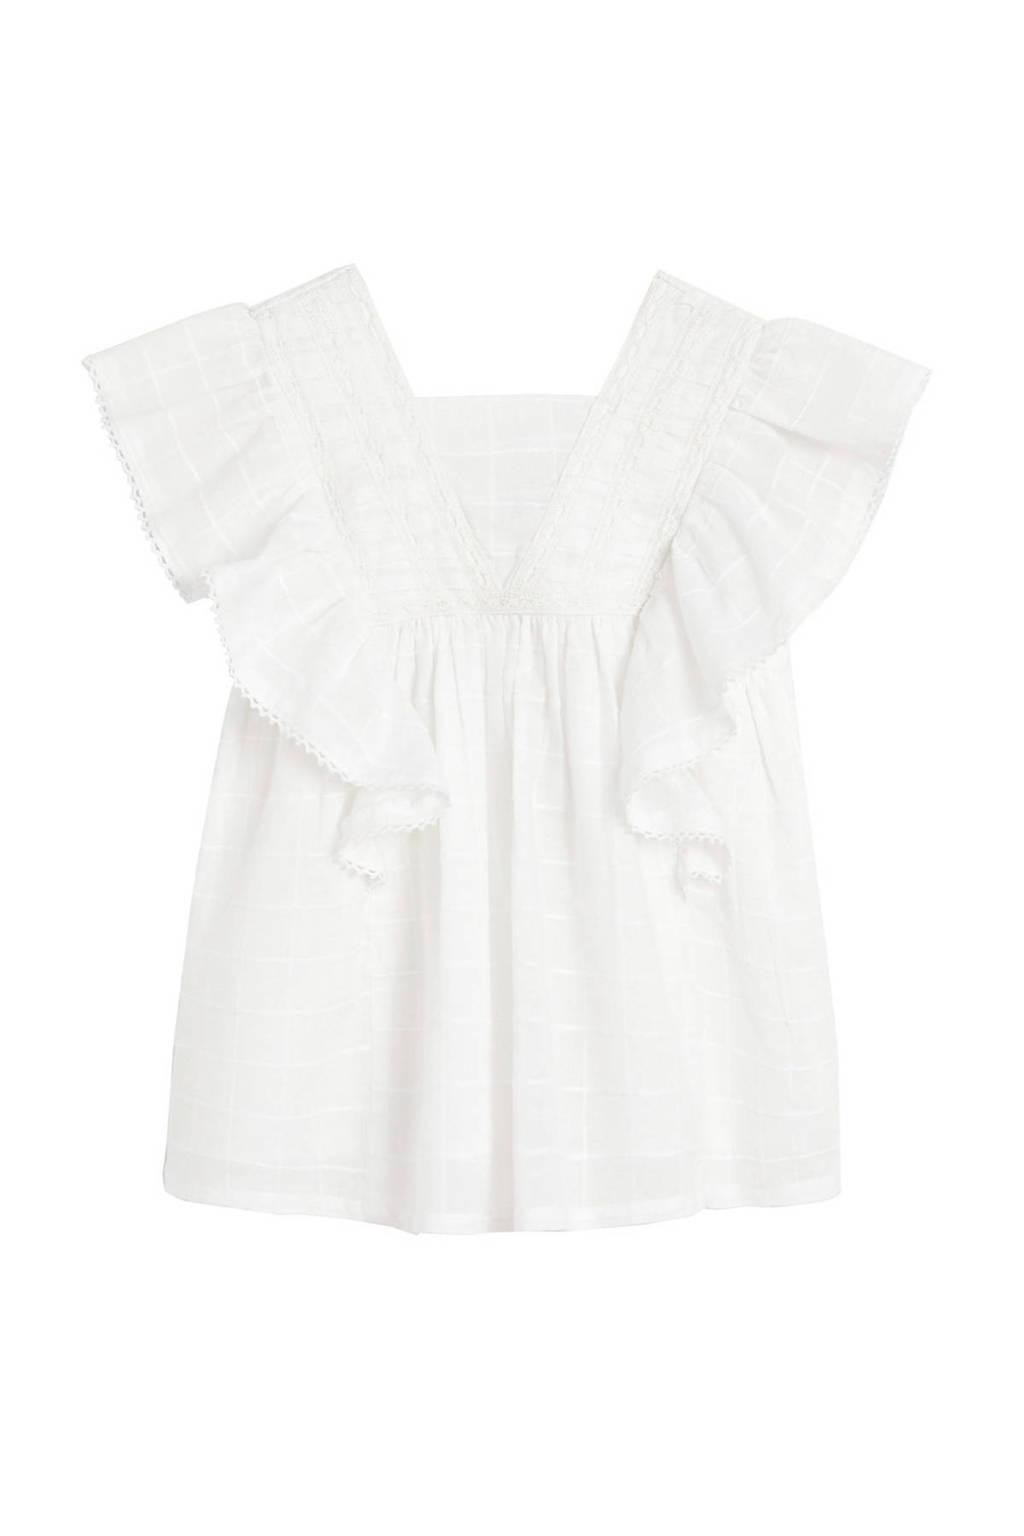 Mango Kids kanten A-lijn jurk met borduursels wit, Wit